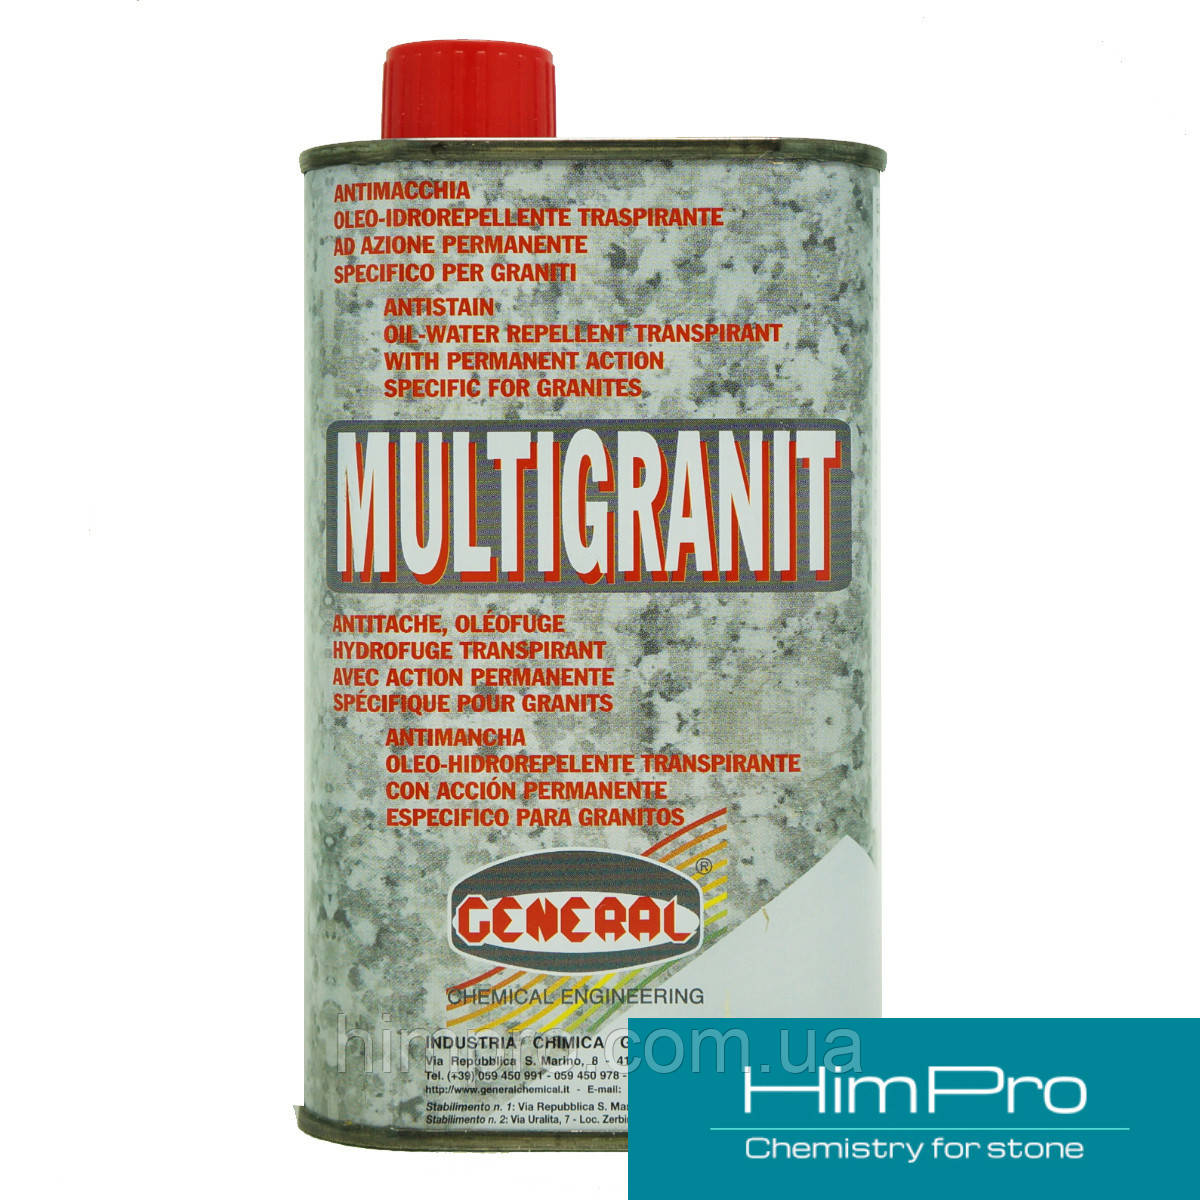 MULTIGRANIT 0.5L General пропитка для гранита